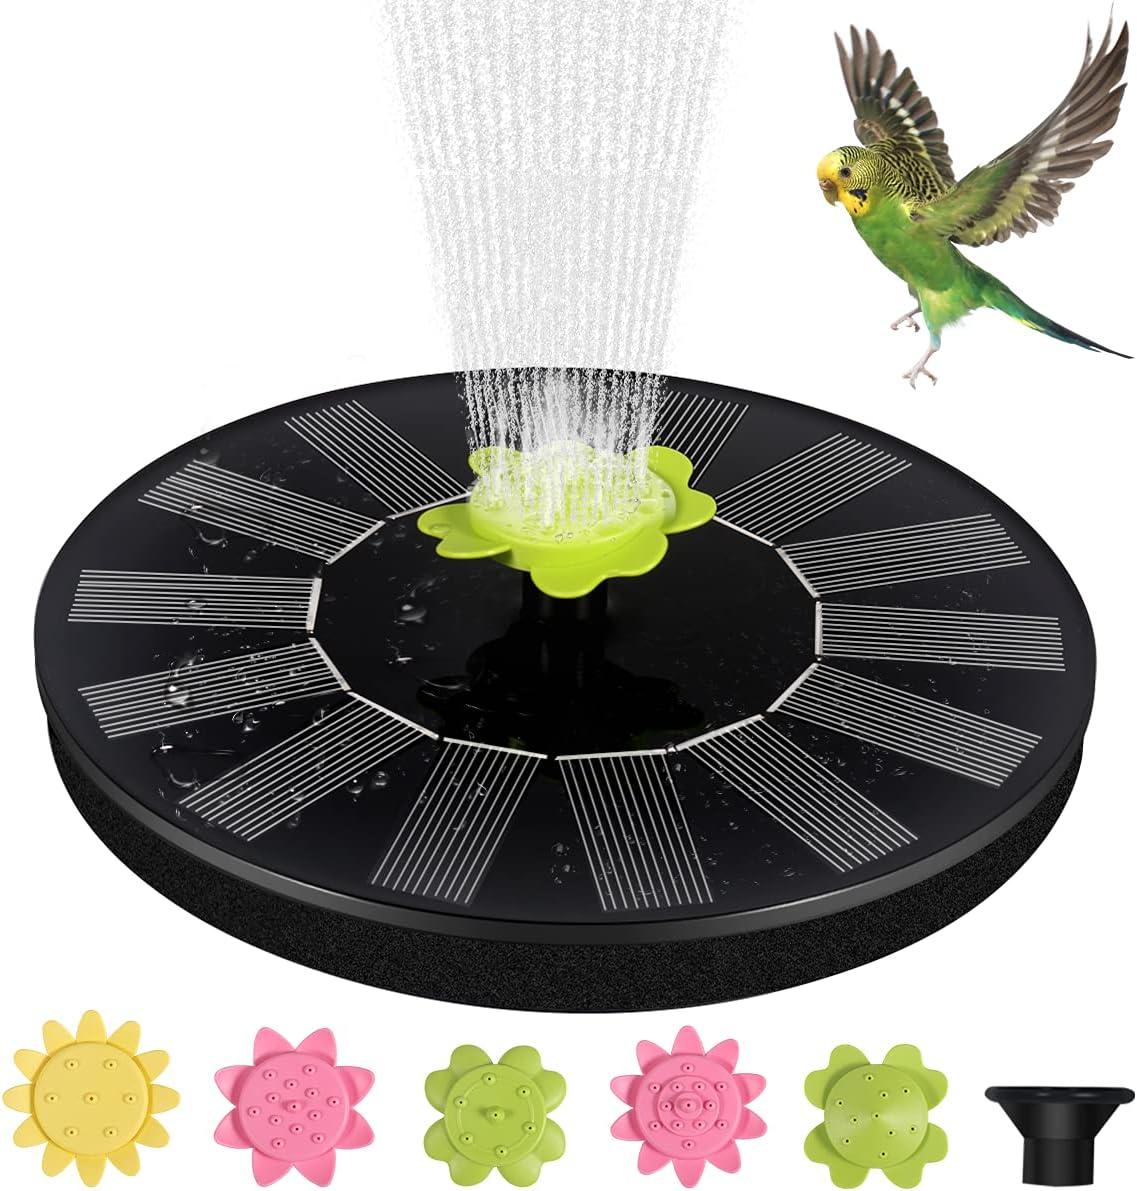 Solar Fountain Pump, 1.4W Solar Powered Fountain with 5 Removable Nozzles, Solar Bird Bath Fountain Suitable for Pond, Garden, Patio, Outdoor